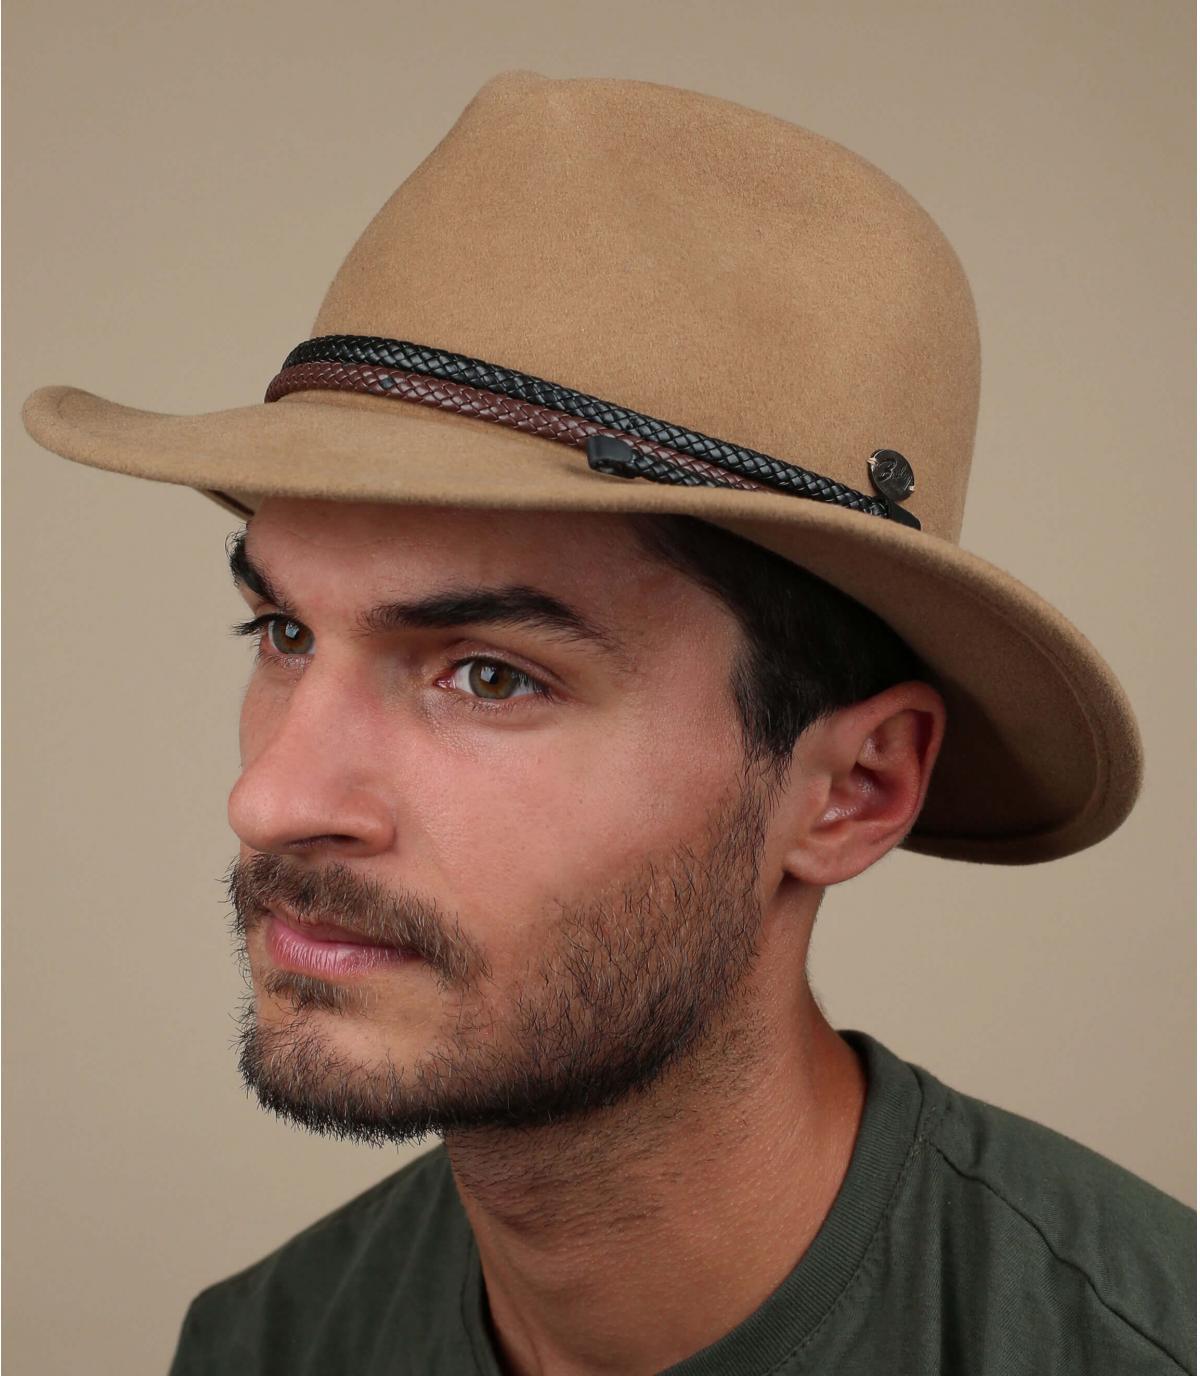 cappello di feltro beige